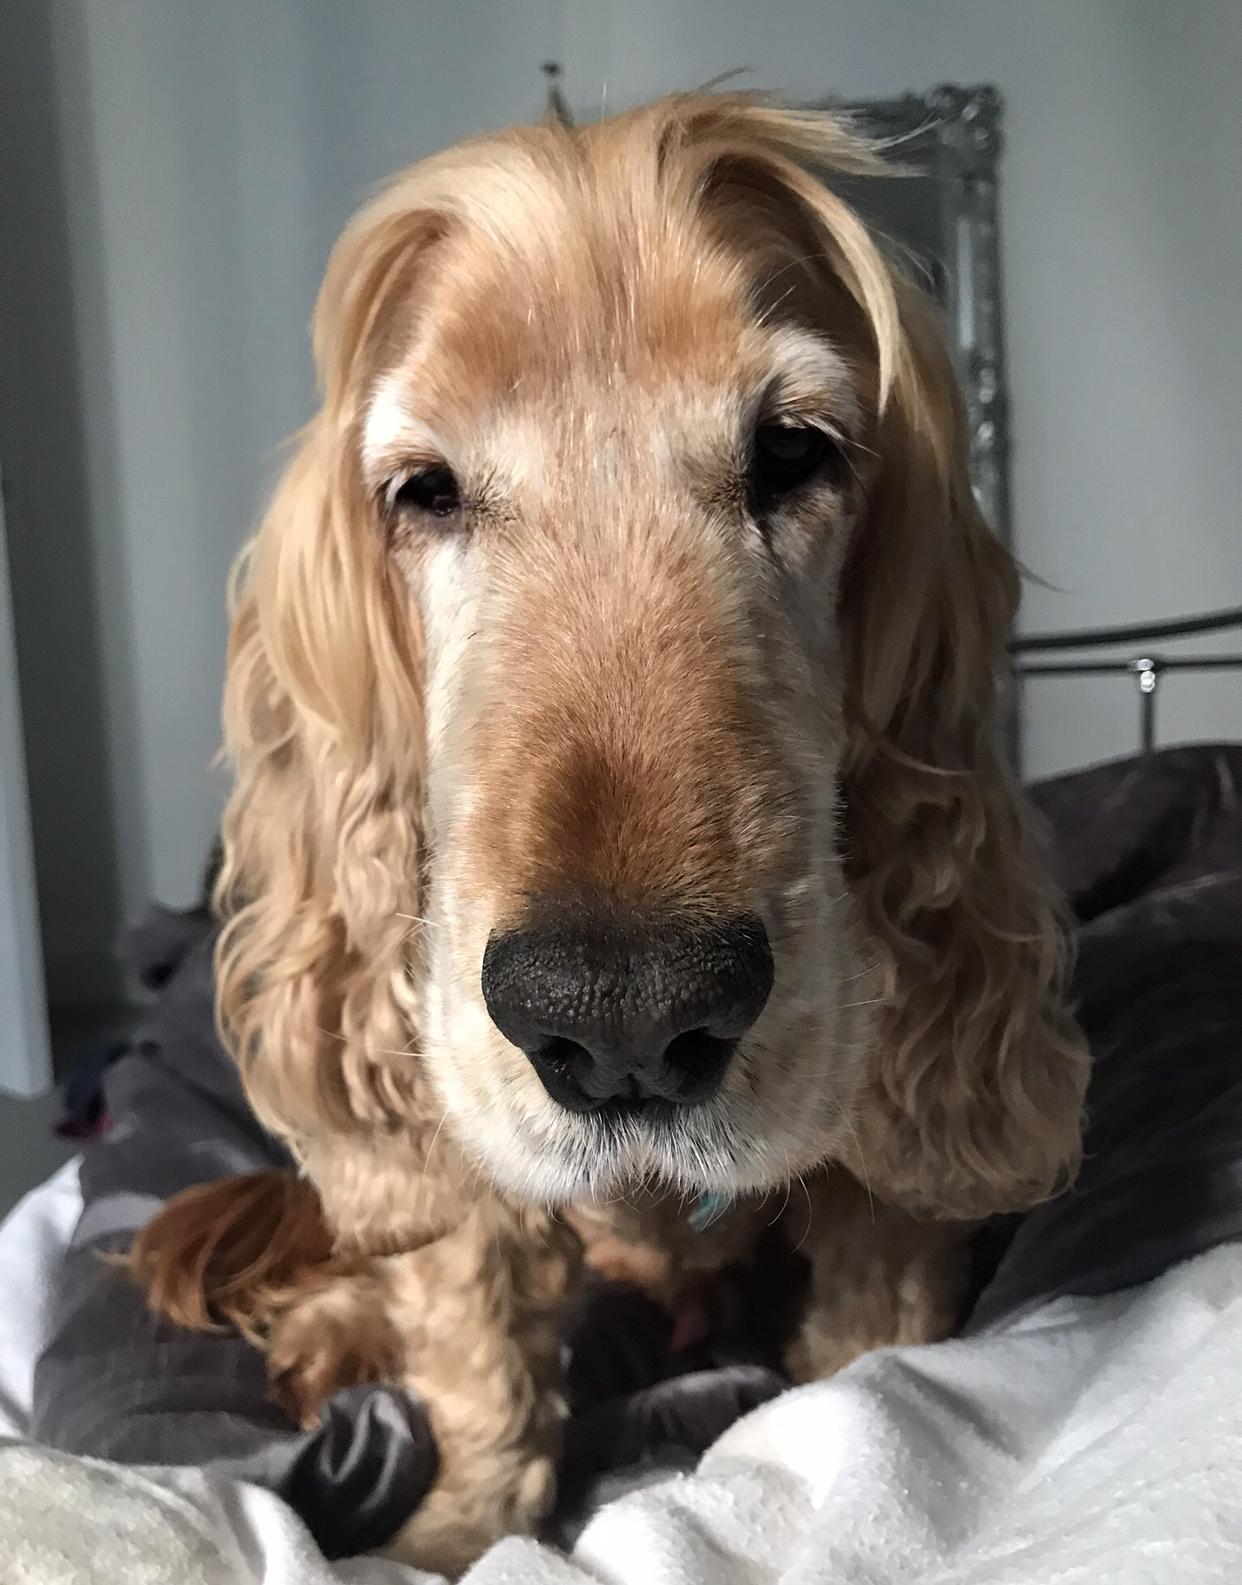 So good to see my brother aka mum's dog Yanni.